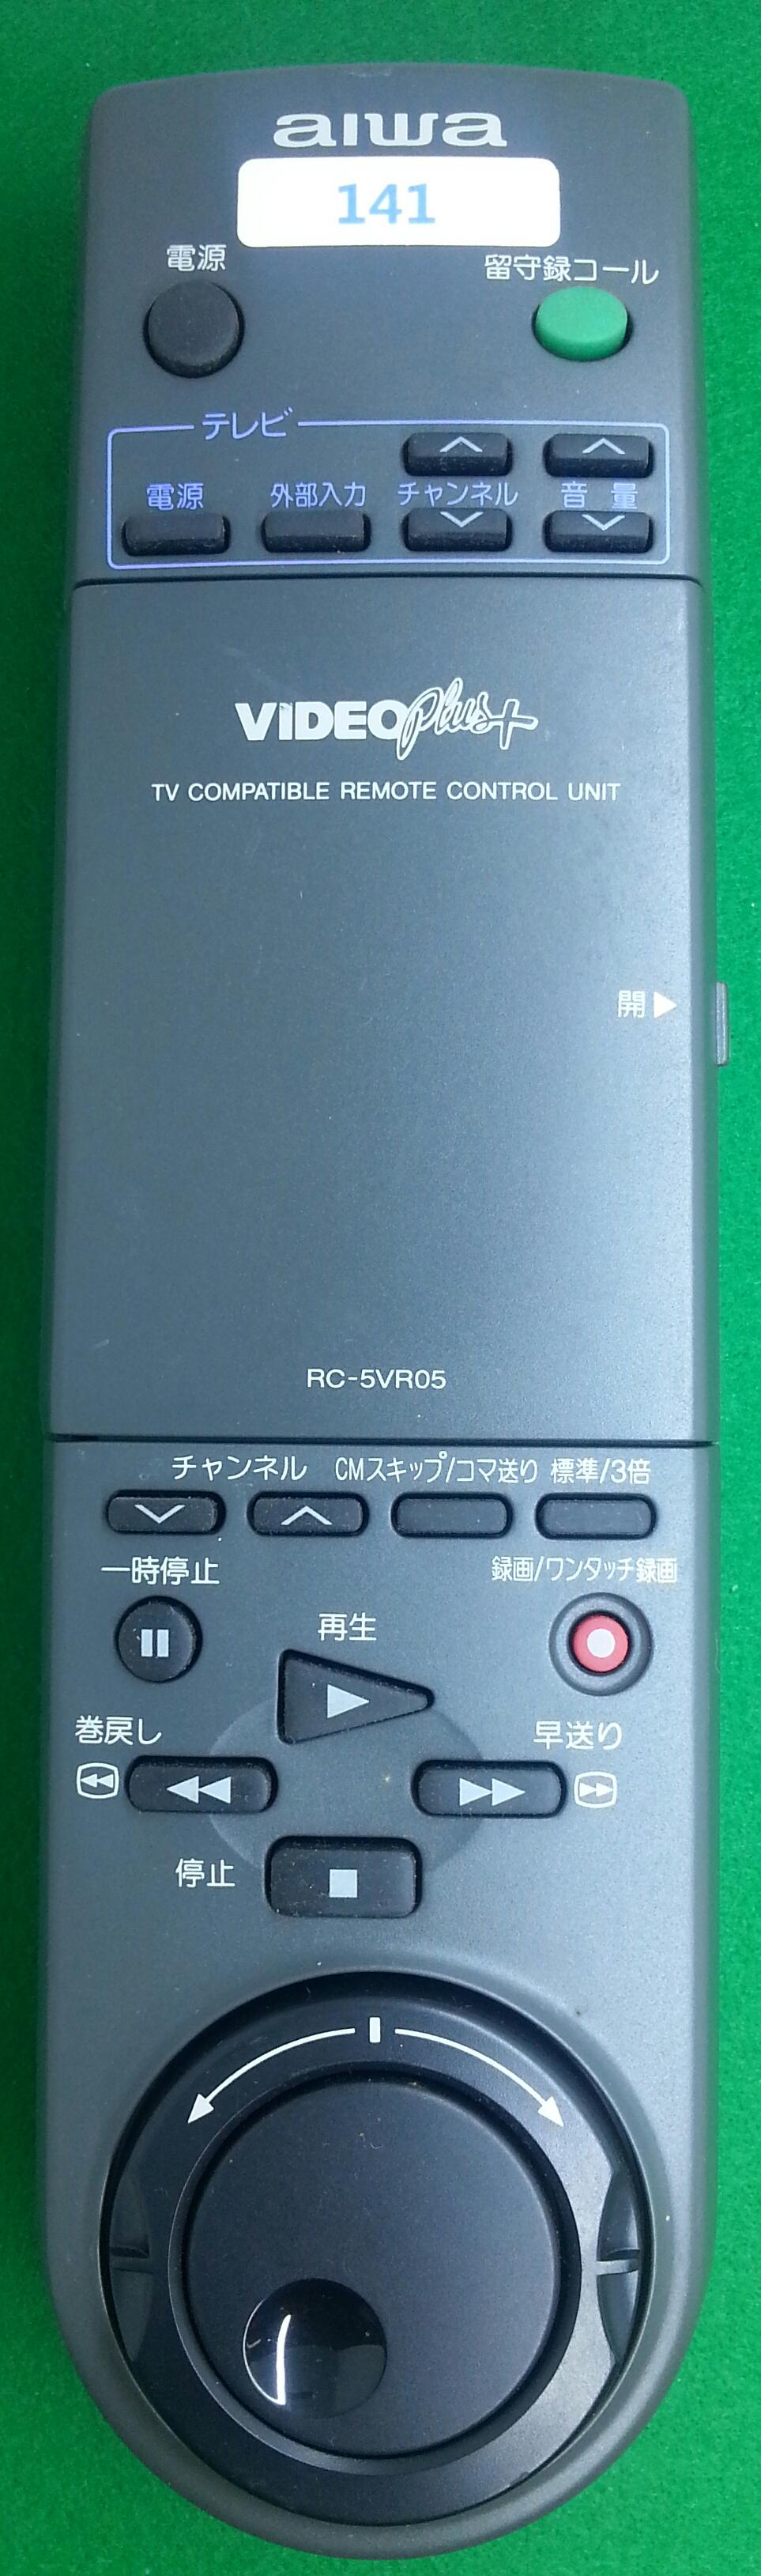 141_AIWA_RC-5VR05-0.jpg